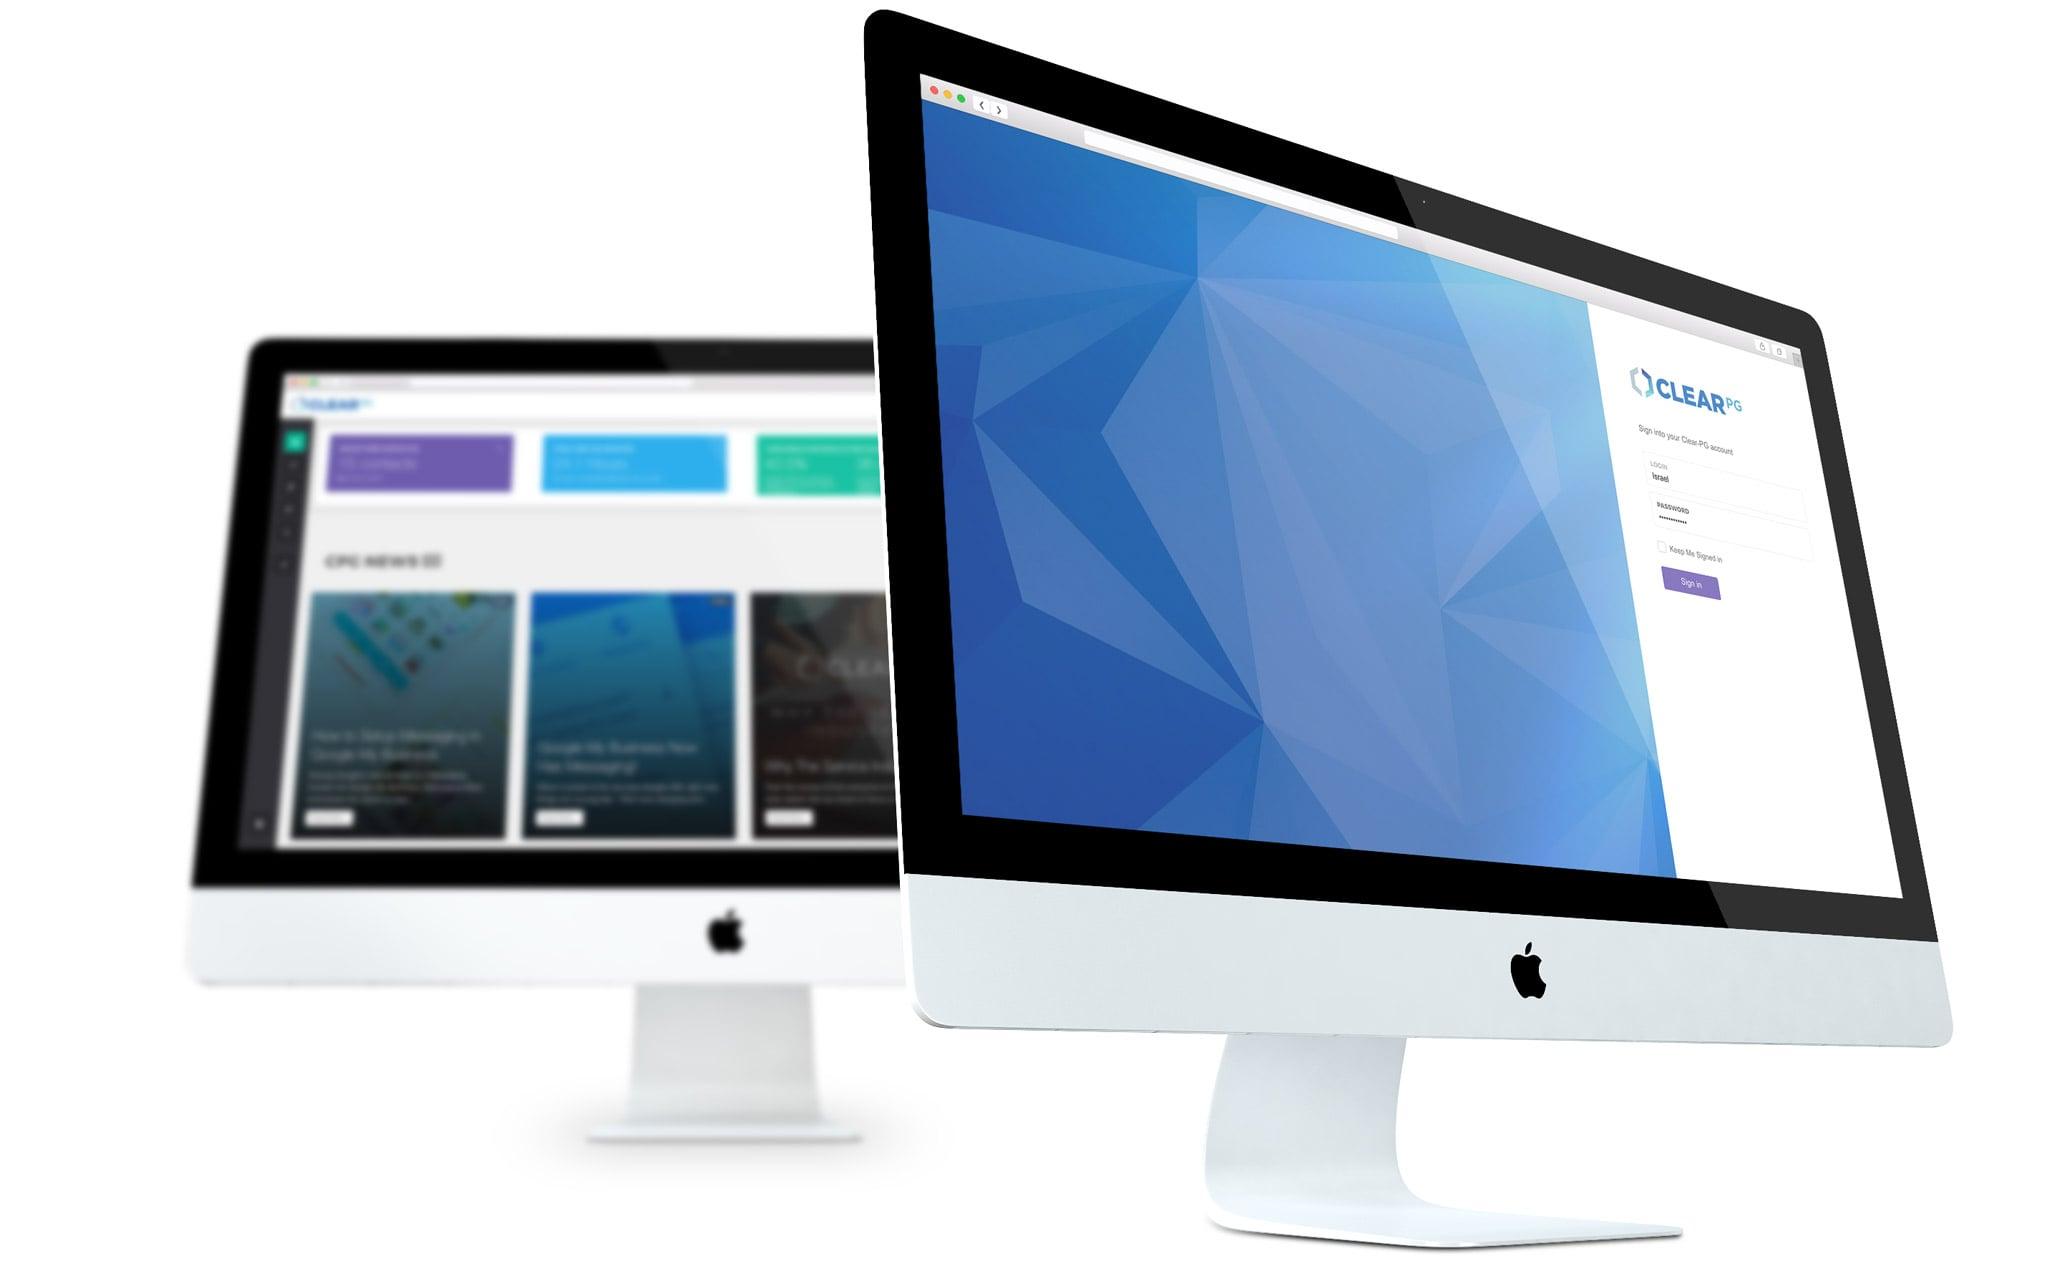 clear-pg-web-app-mockup2 Mobile and Web App Development